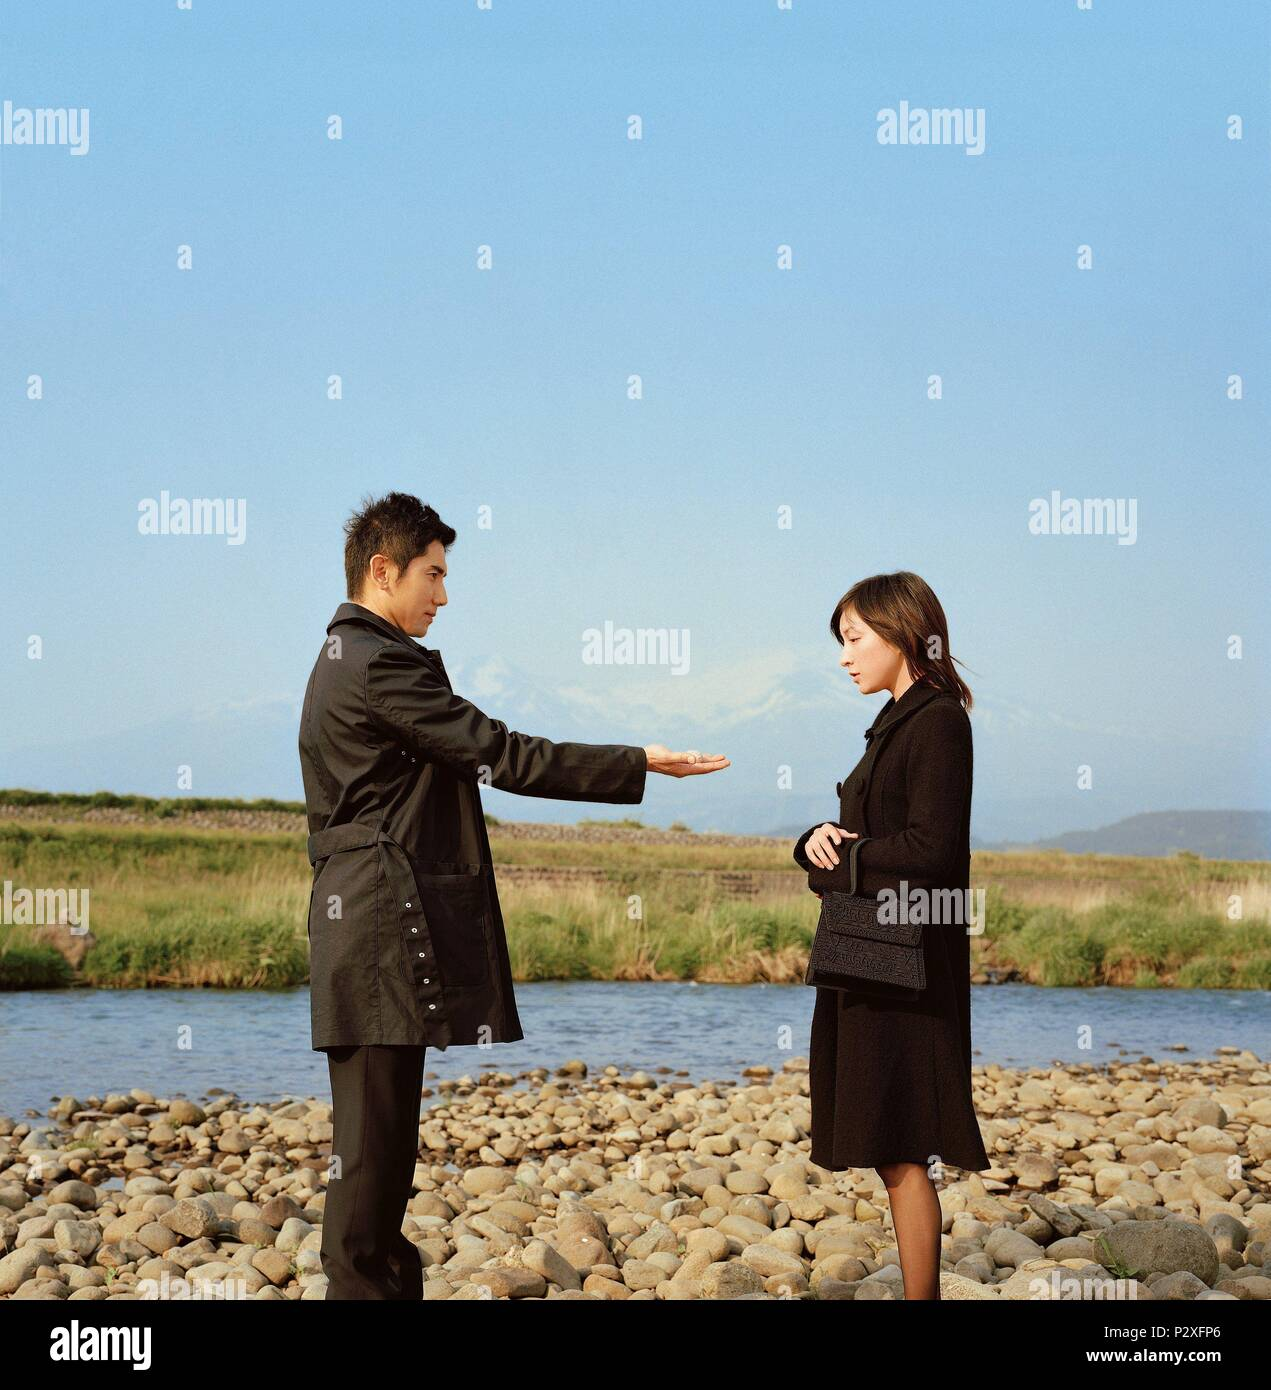 Original Film Title: OKURIBITO.  English Title: DEPARTURES.  Film Director: YOJIRO TAKITA.  Year: 2008.  Stars: RYOKO HIROSUE; MASAHIRO MOTOKI. Credit: AMUSE SOFT ENTERTAINMENT/ASAHI SHIMBUNSHA/DENTSU / Album - Stock Image